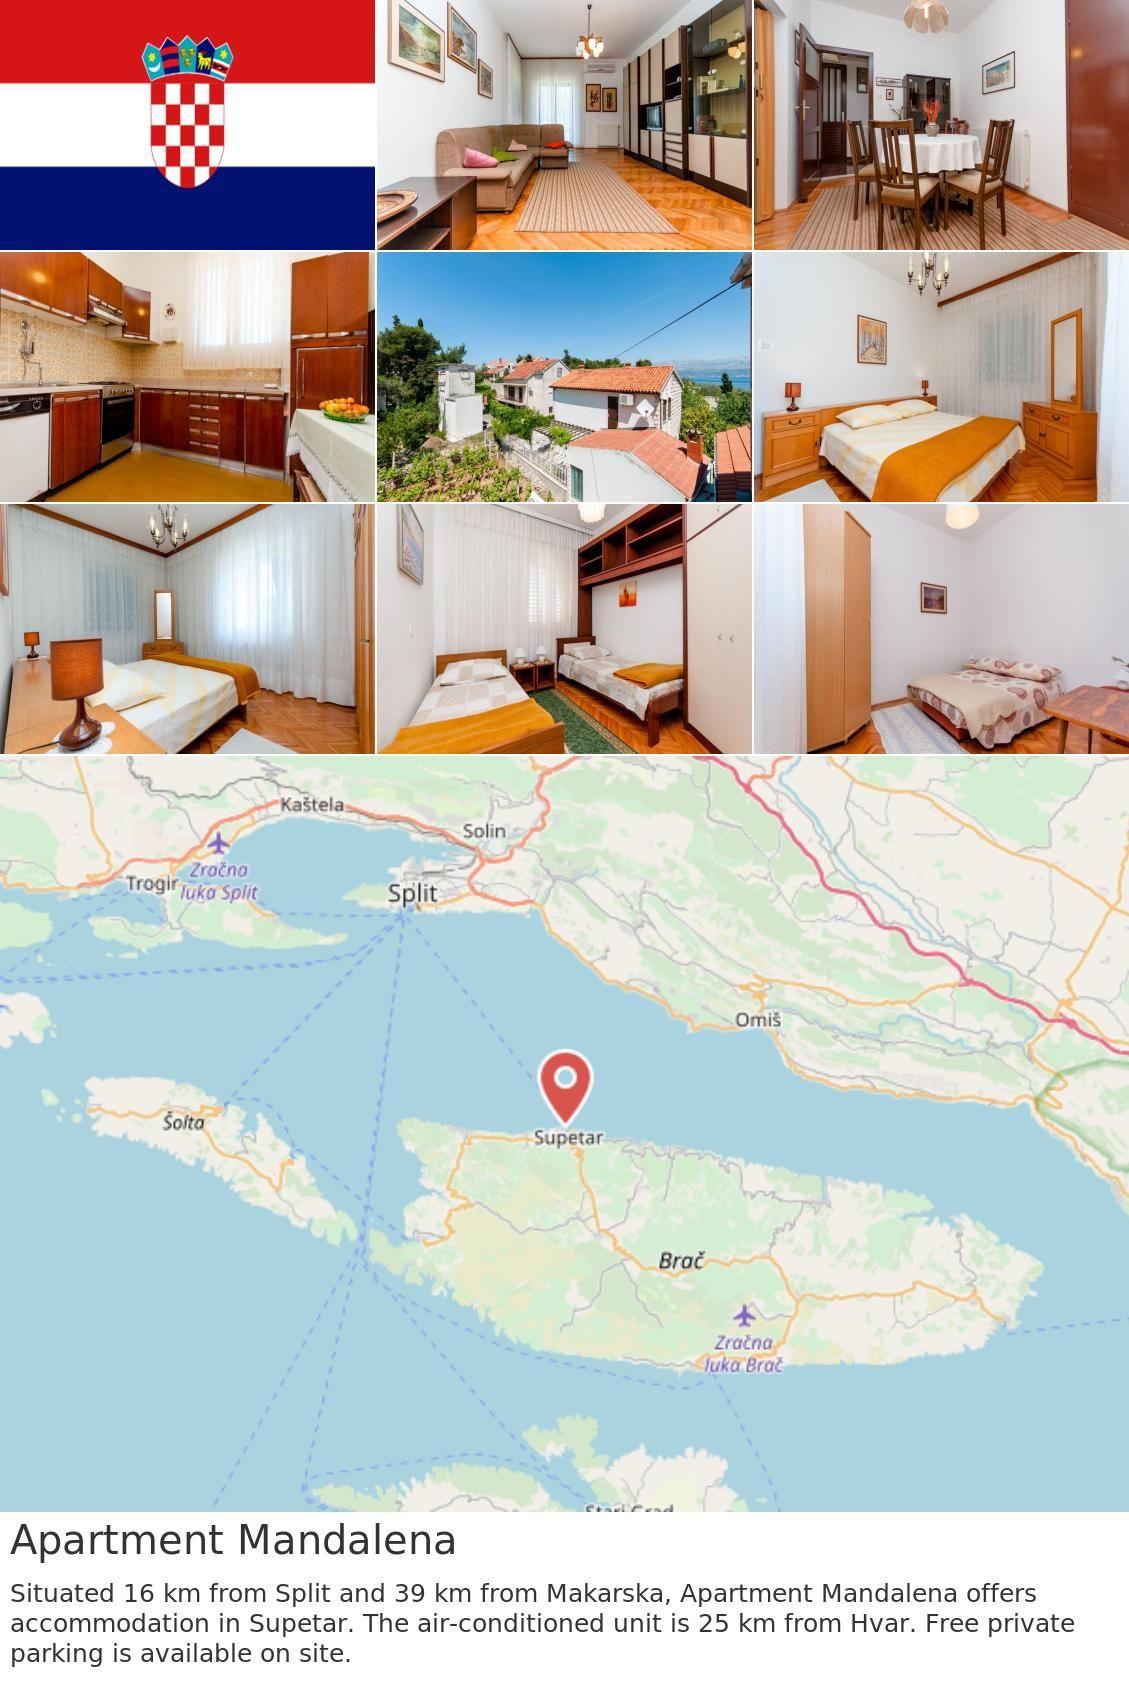 Apartment Mandalena | Croatia | Croatia, Free wifi, Wifi